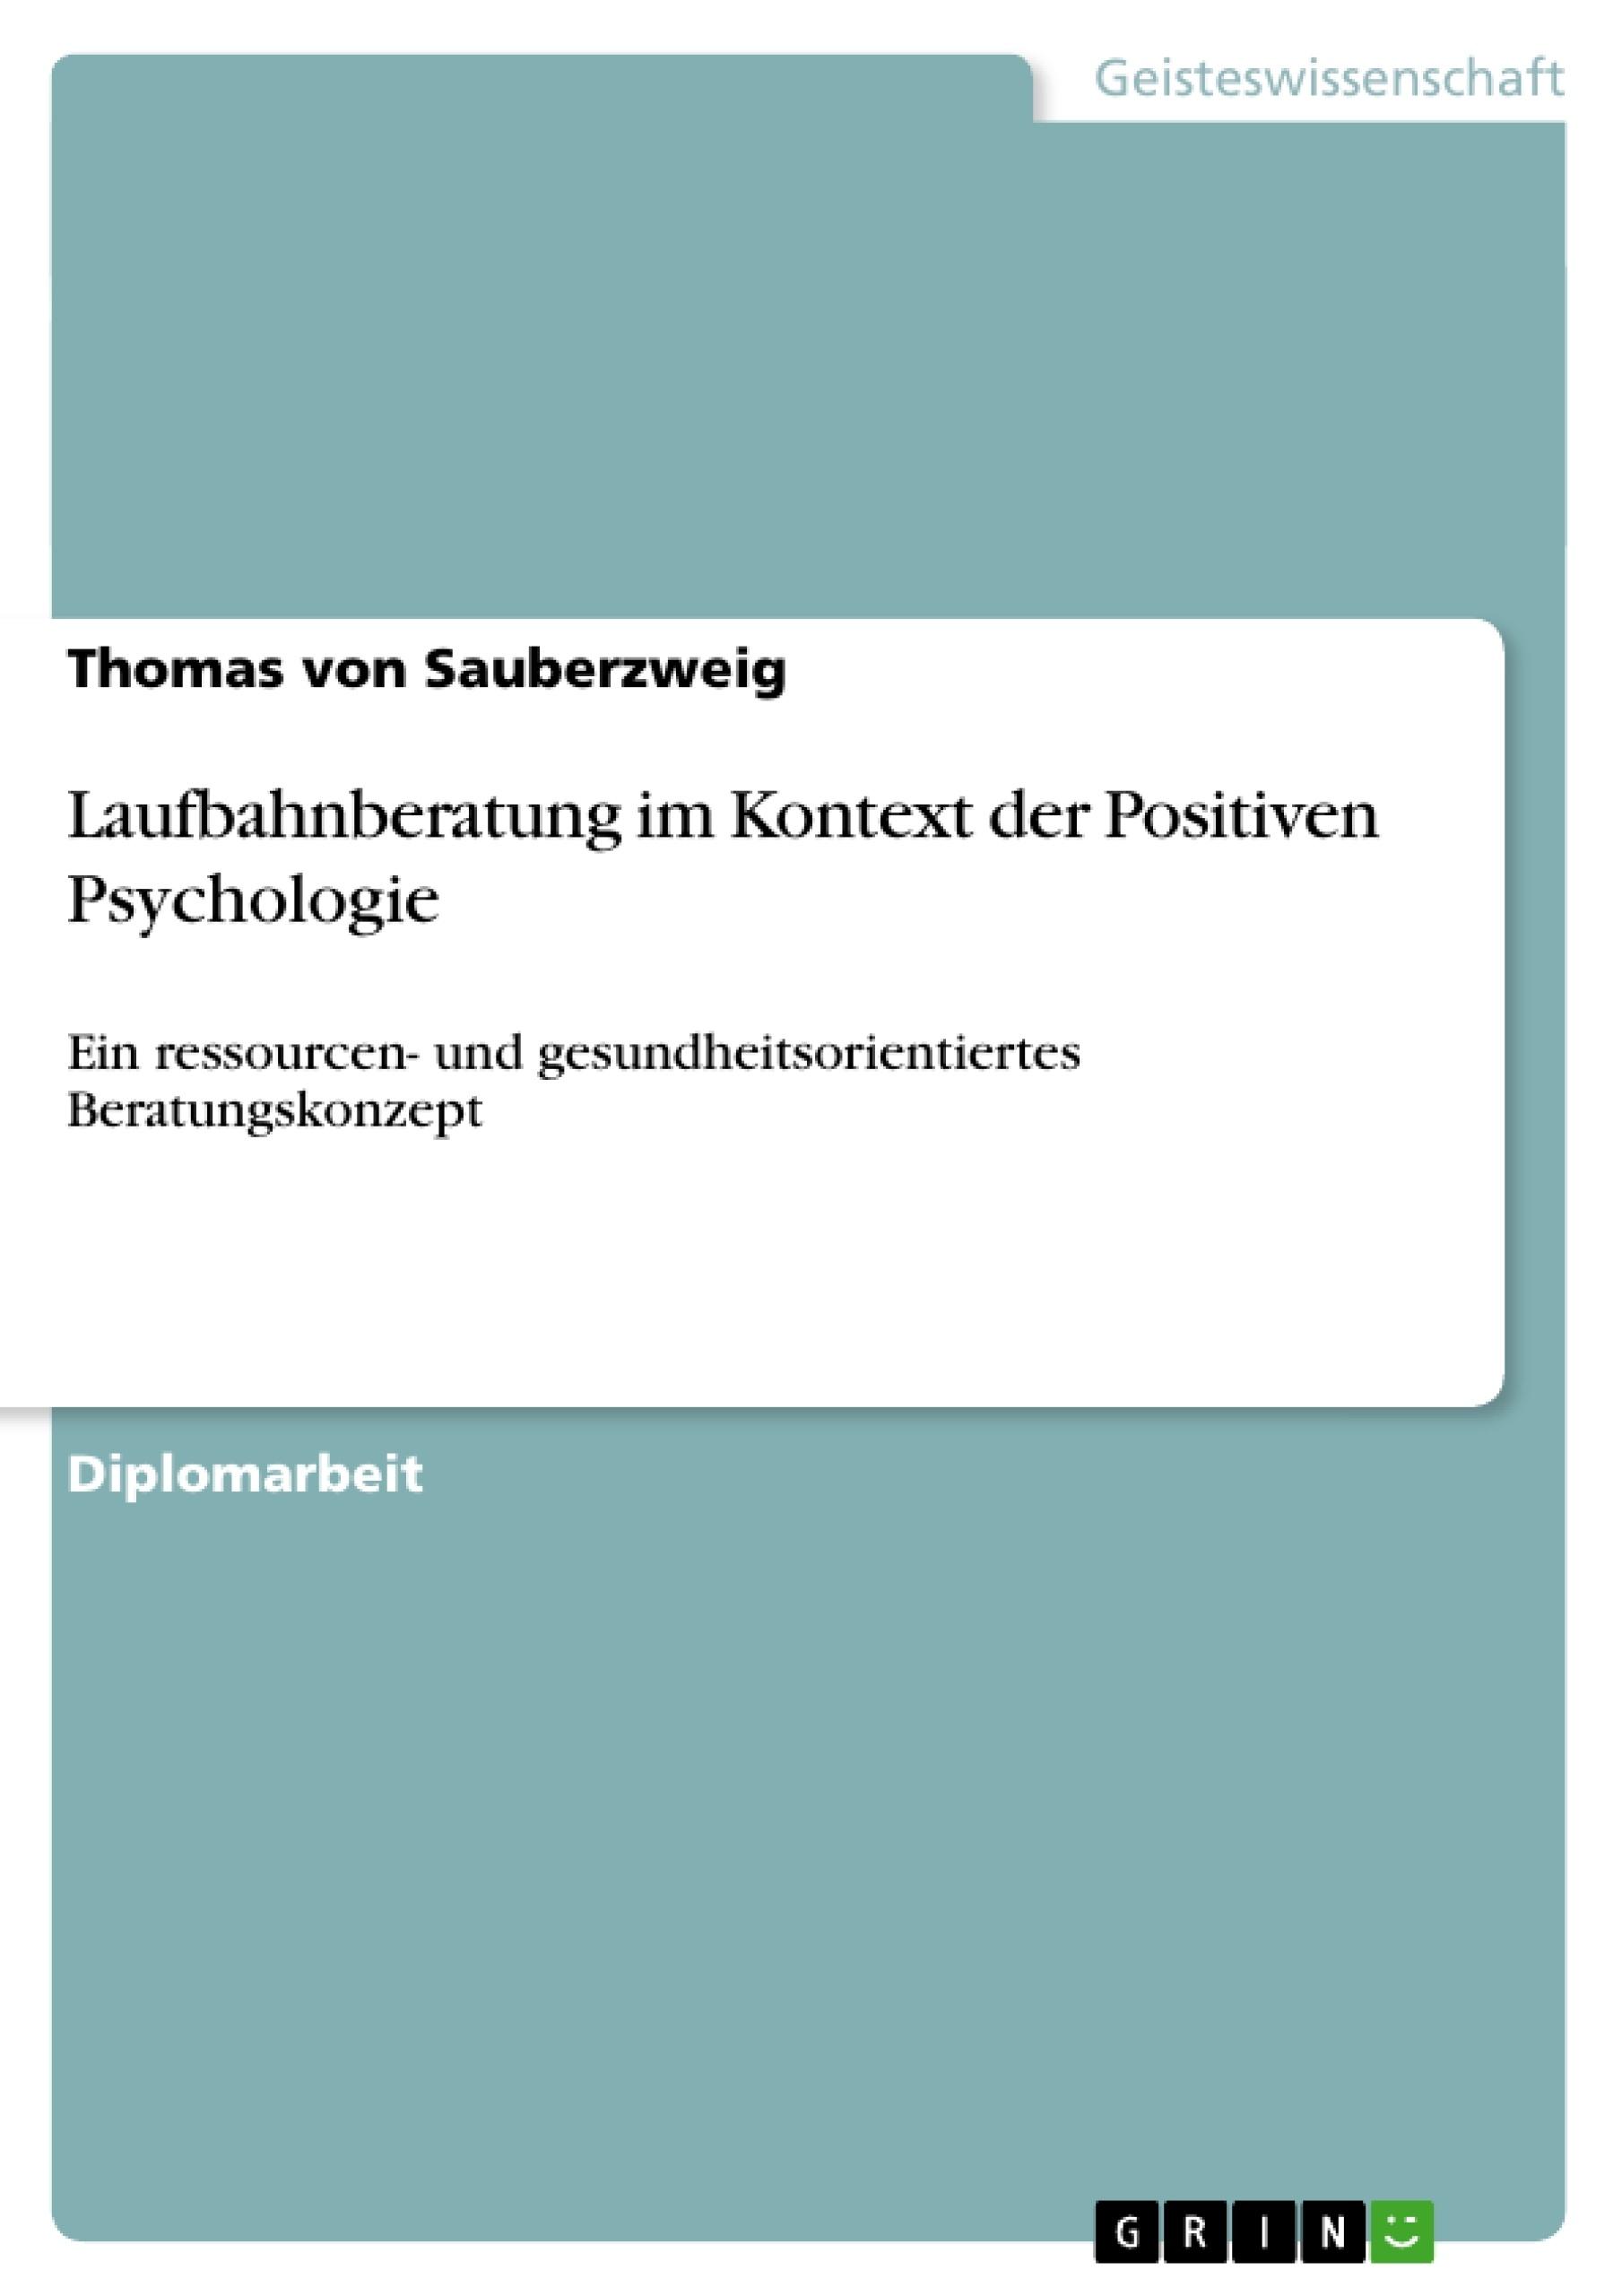 Titel: Laufbahnberatung im Kontext der Positiven Psychologie